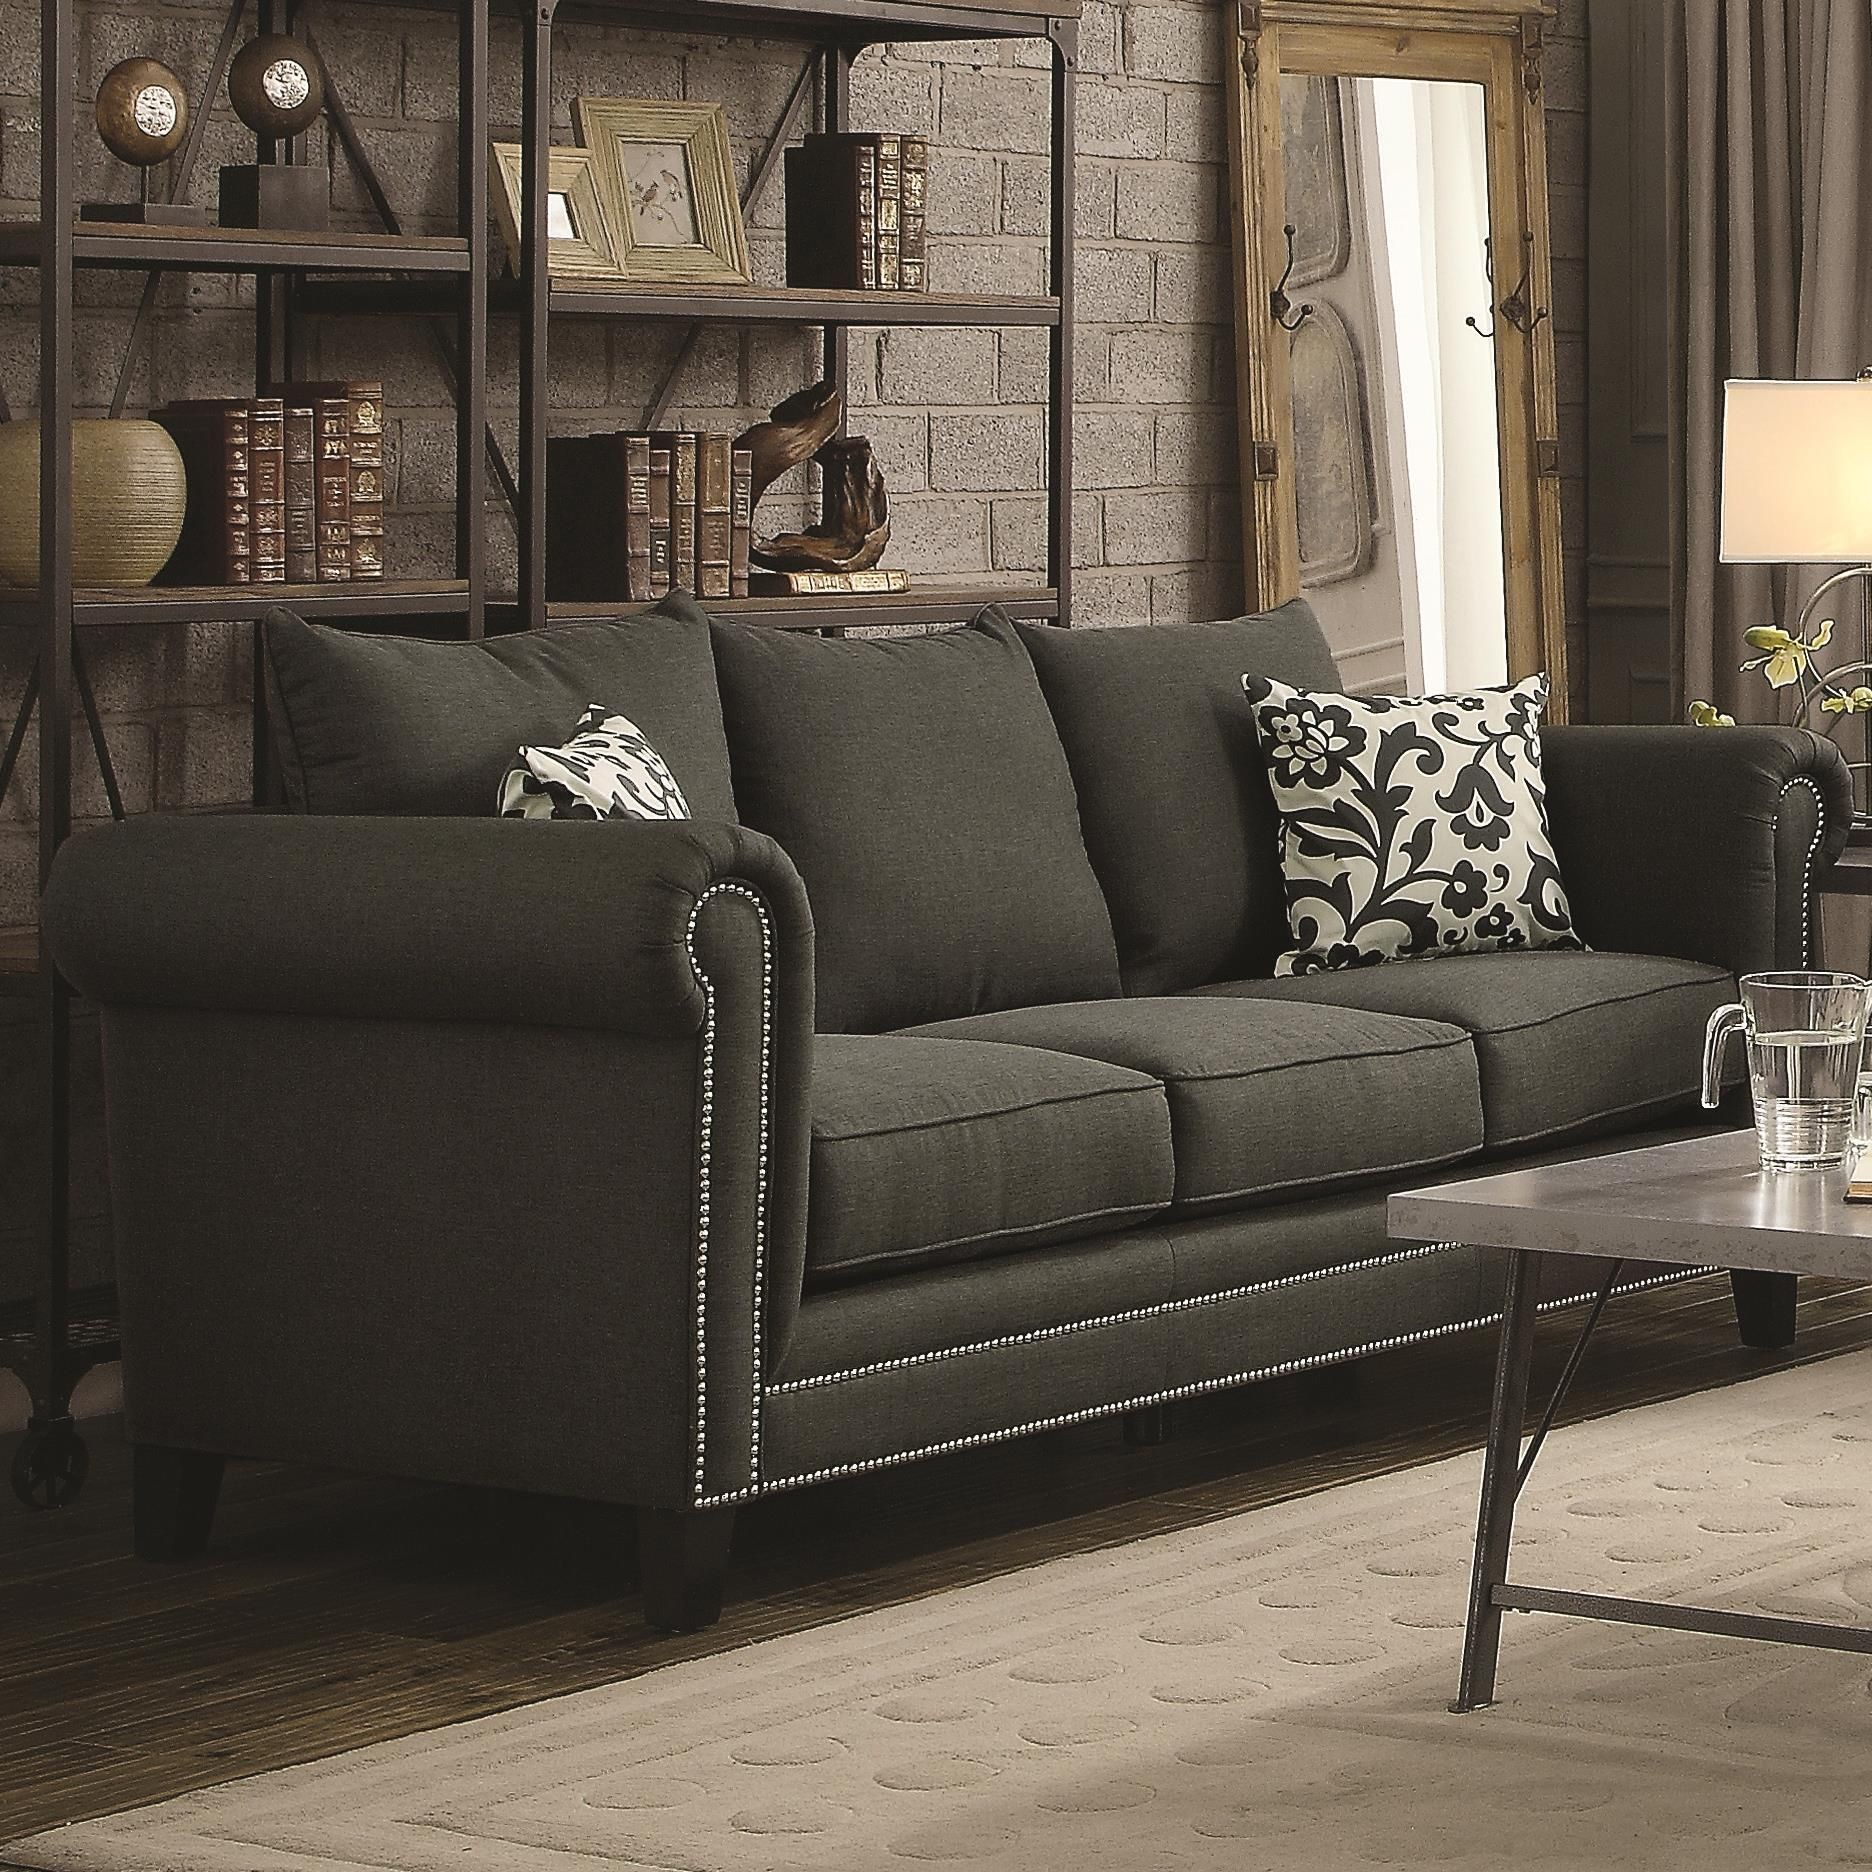 Emerson charcoal sofa 604970